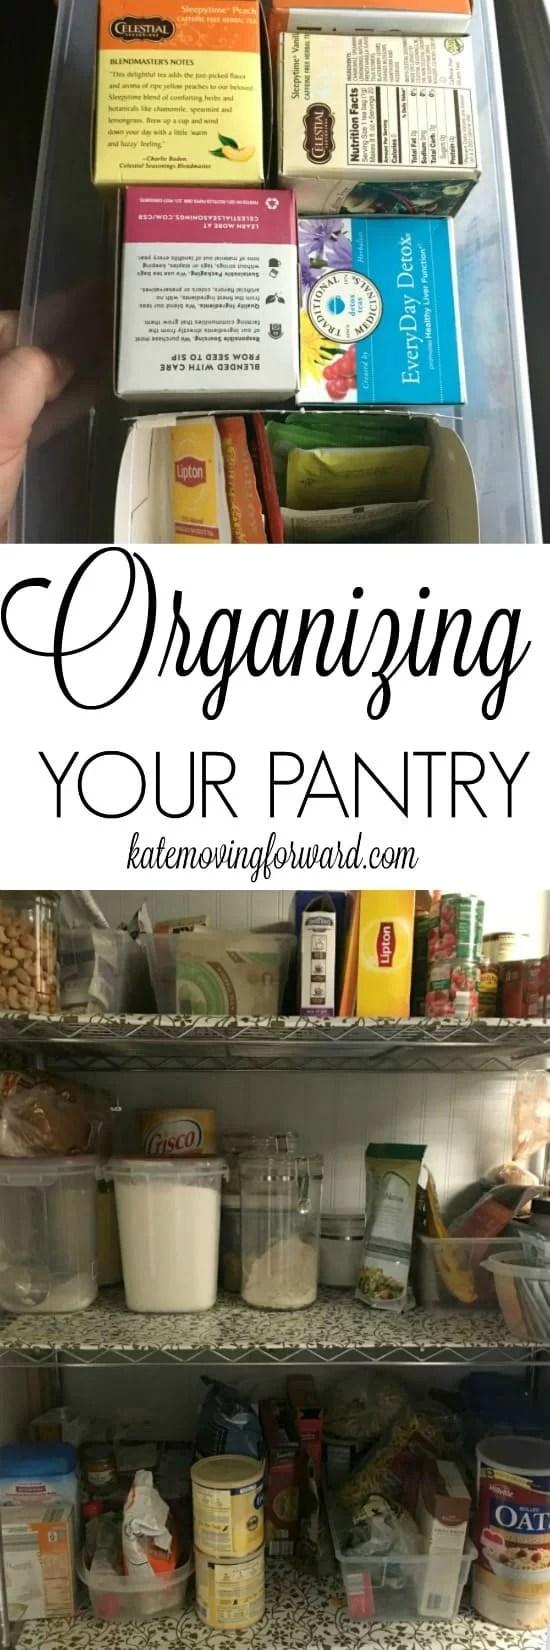 Pantry Organization - Organize Pantry - Organize Kitchen  - Pantry Help - Pantry Organization Ideas